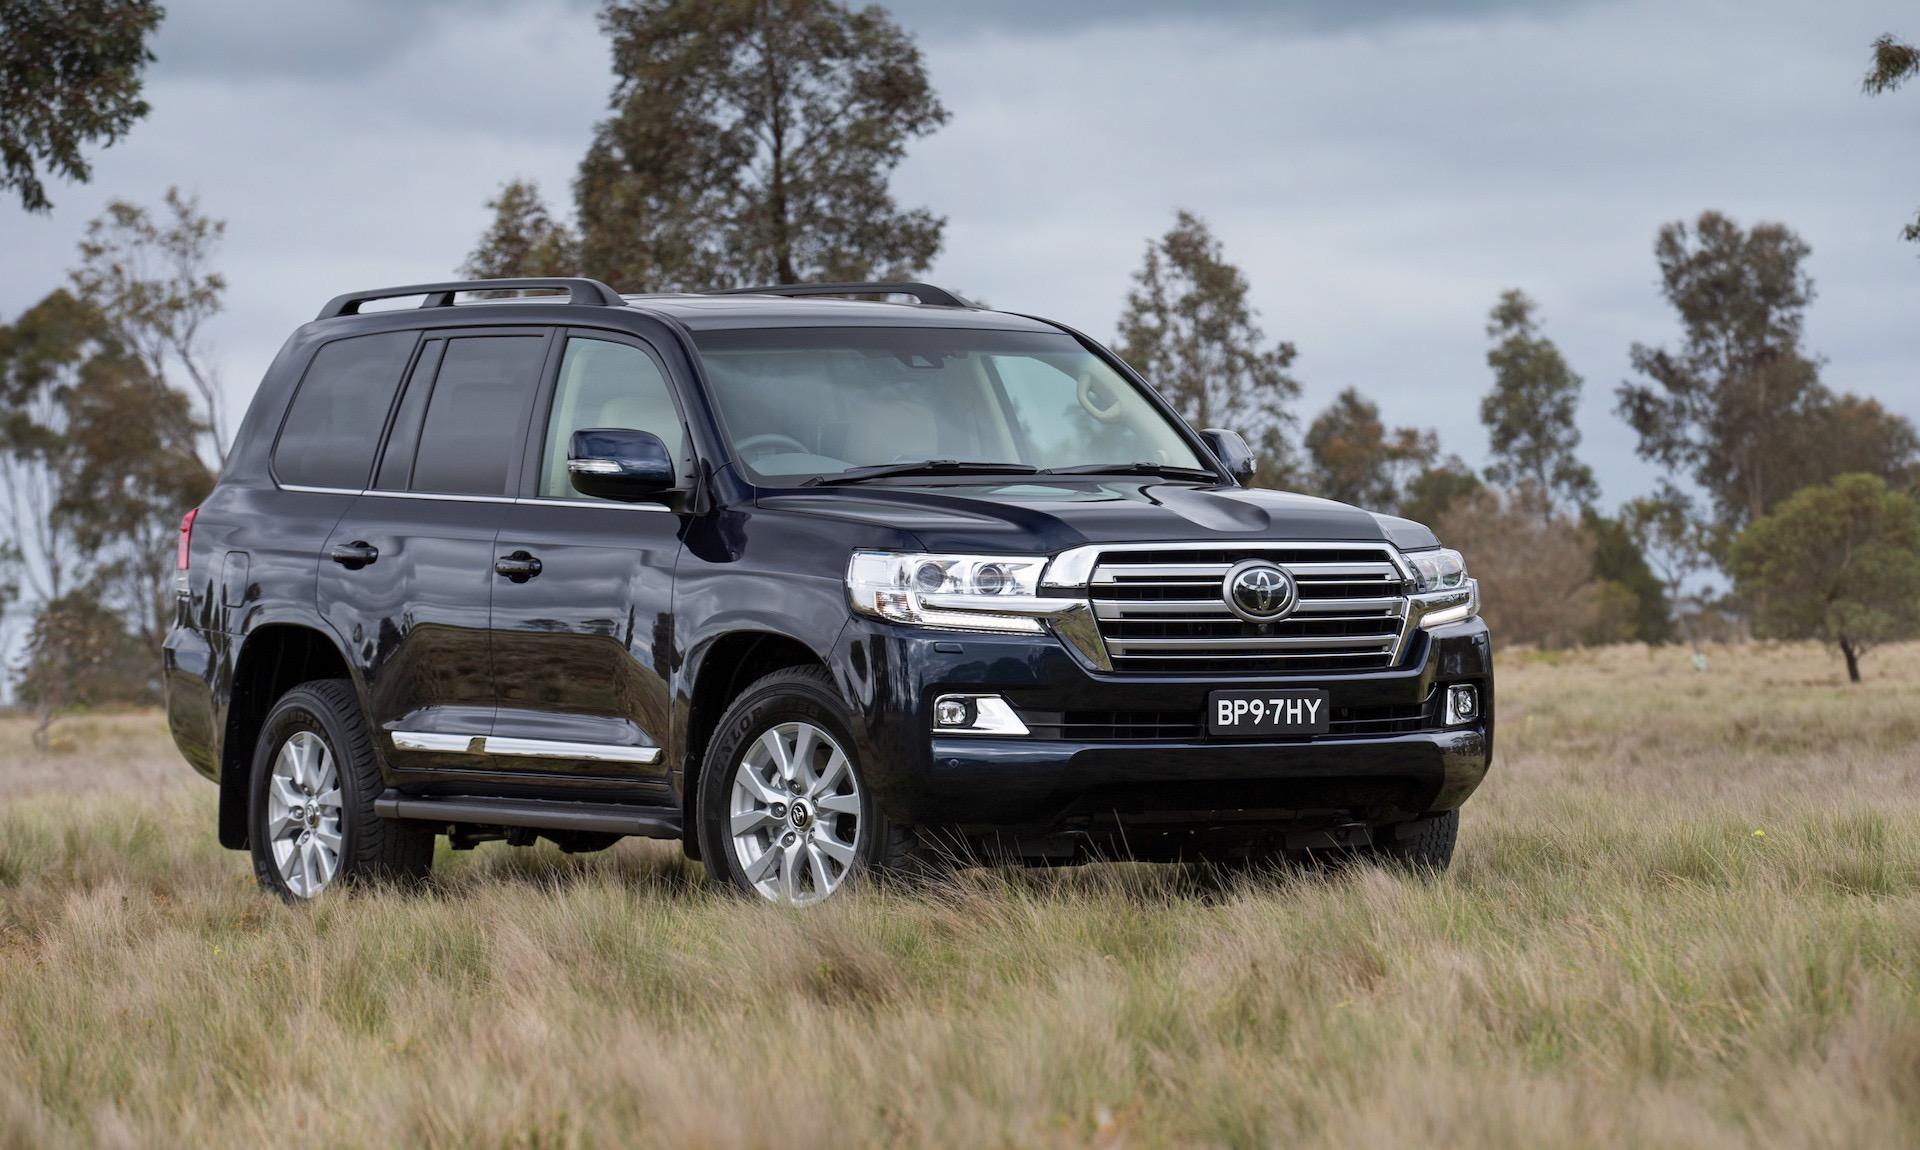 Kelebihan Kekurangan Toyota Land Cruiser V8 2018 Tangguh